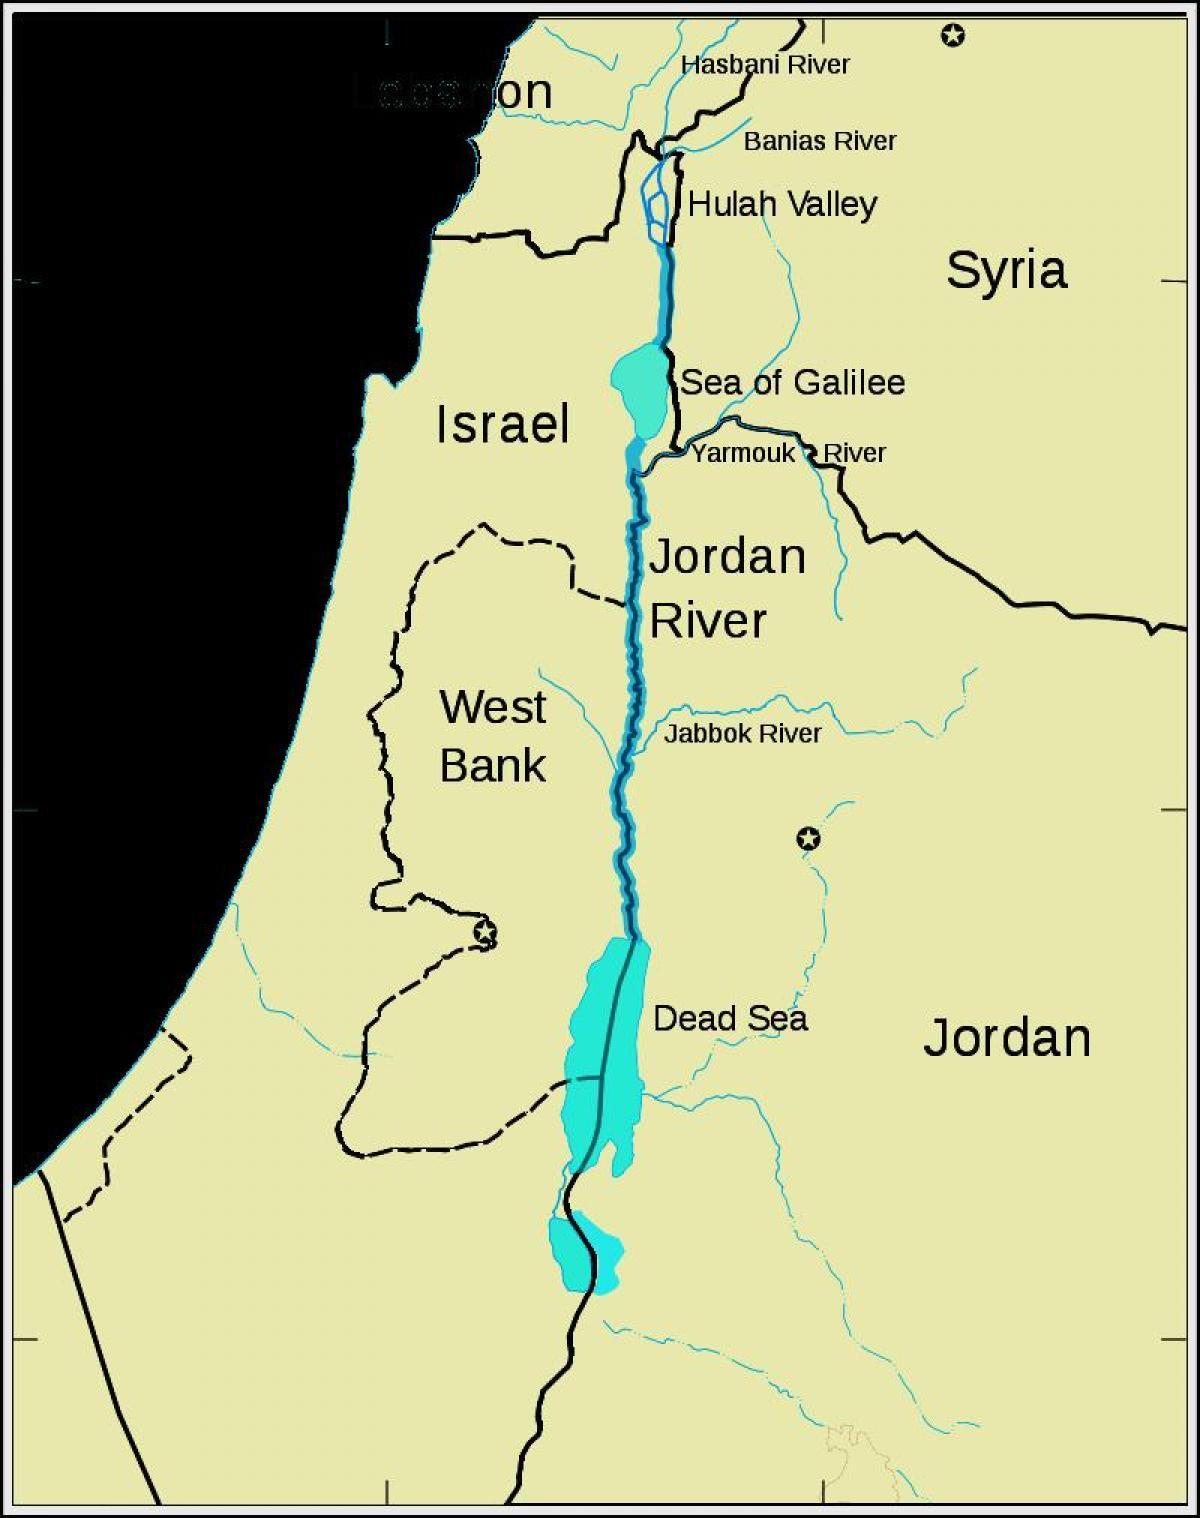 Jordan-river-Karte - Jordan, middle east map (West-Asien - Asia)